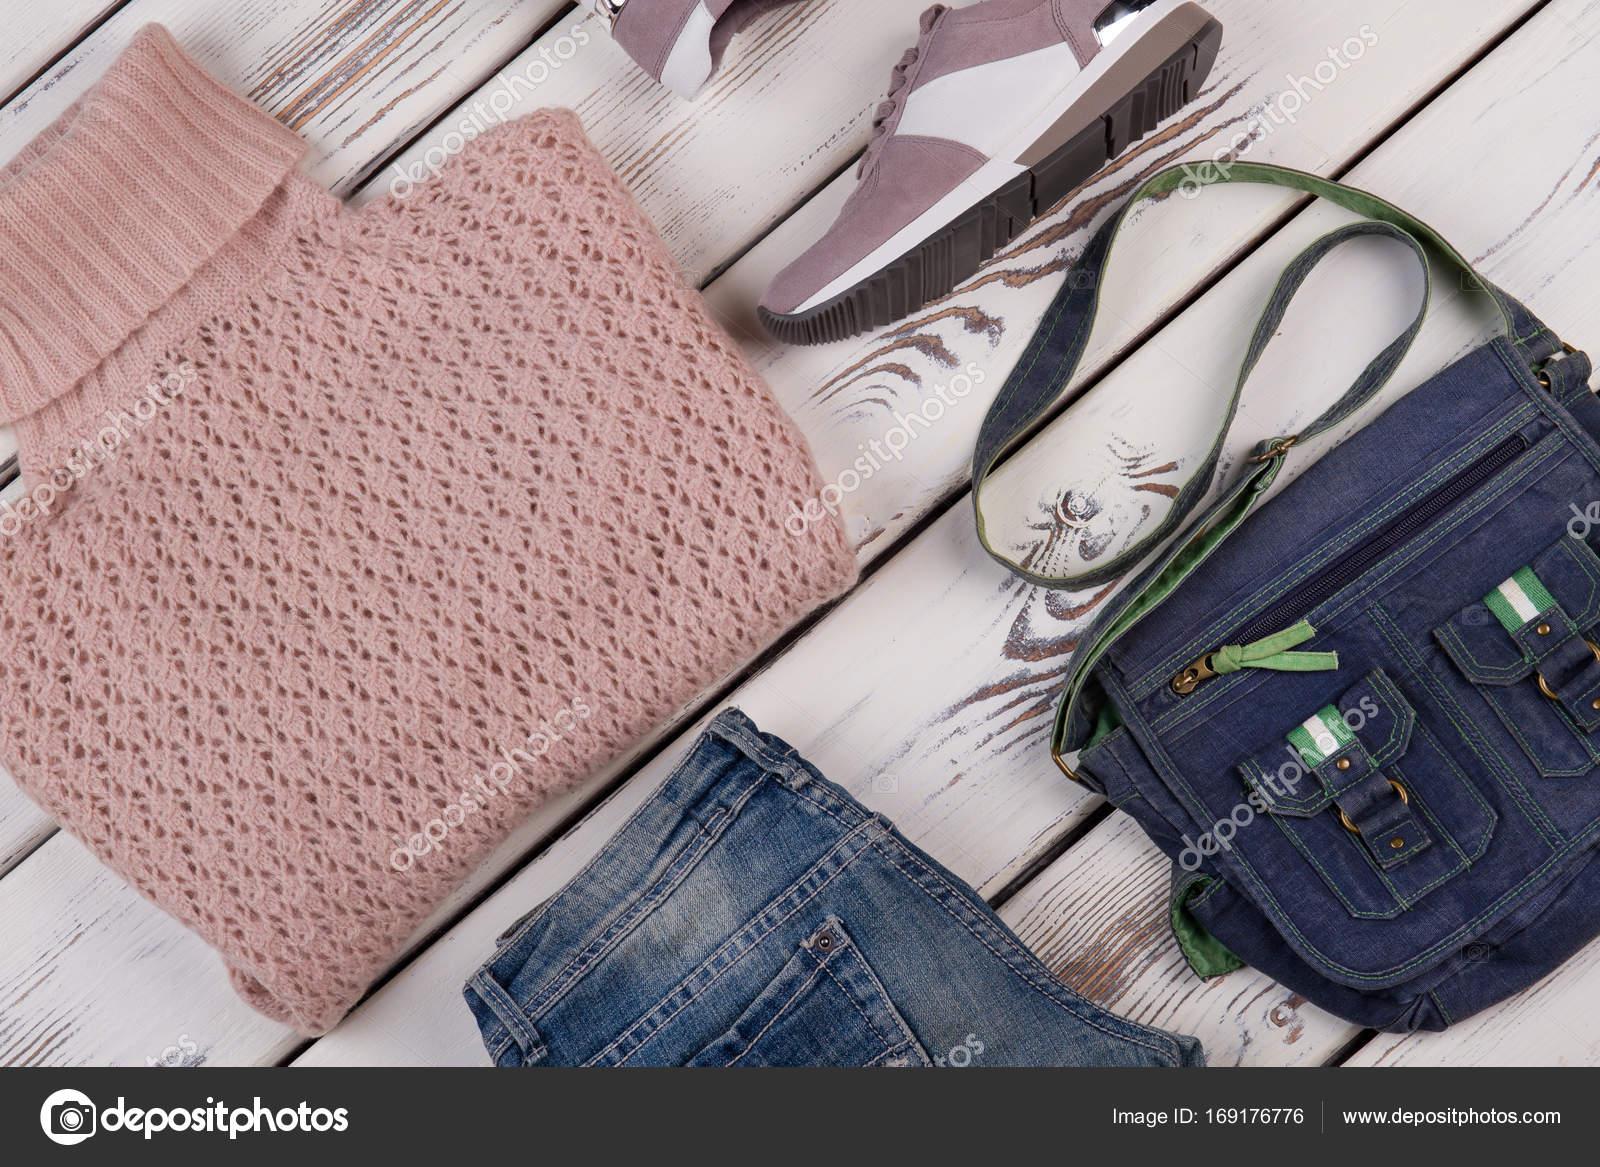 e9dbe25b376e Casual Γυναικεία ρούχα — Φωτογραφία Αρχείου © margostock  169176776